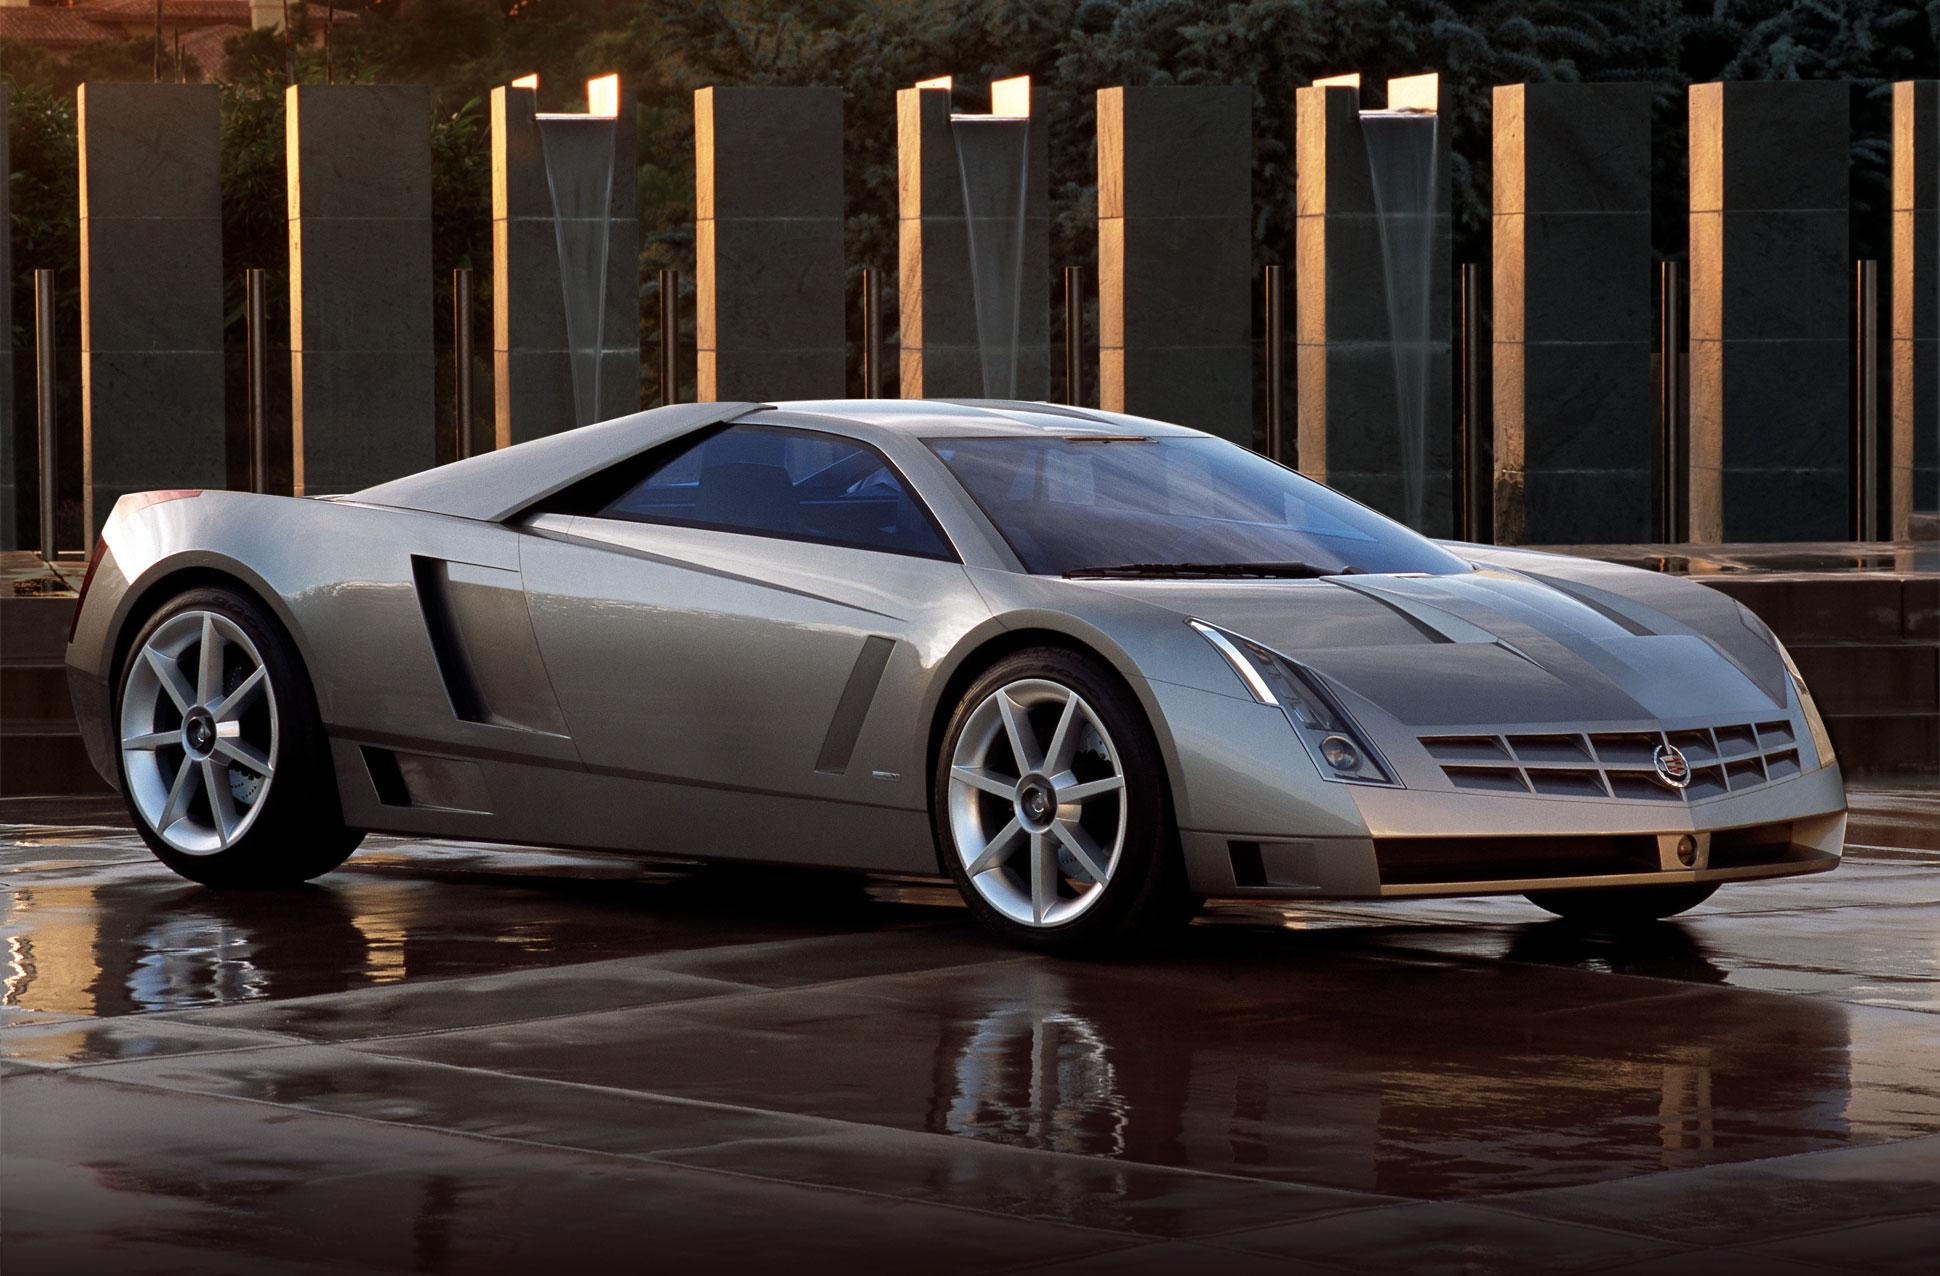 Simon Cox's magnificent 2002 Cadillac Cien